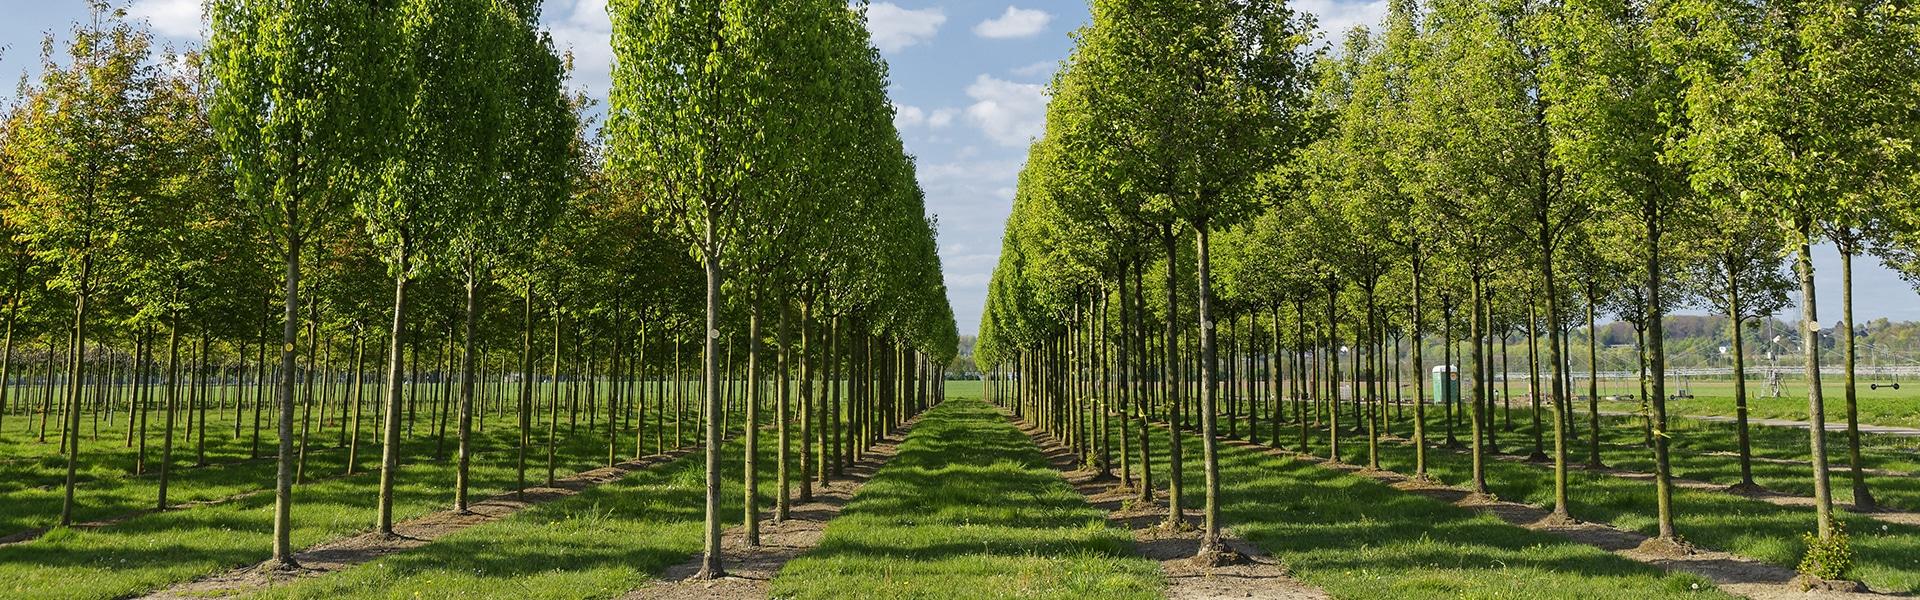 Baumschule junge Bäume